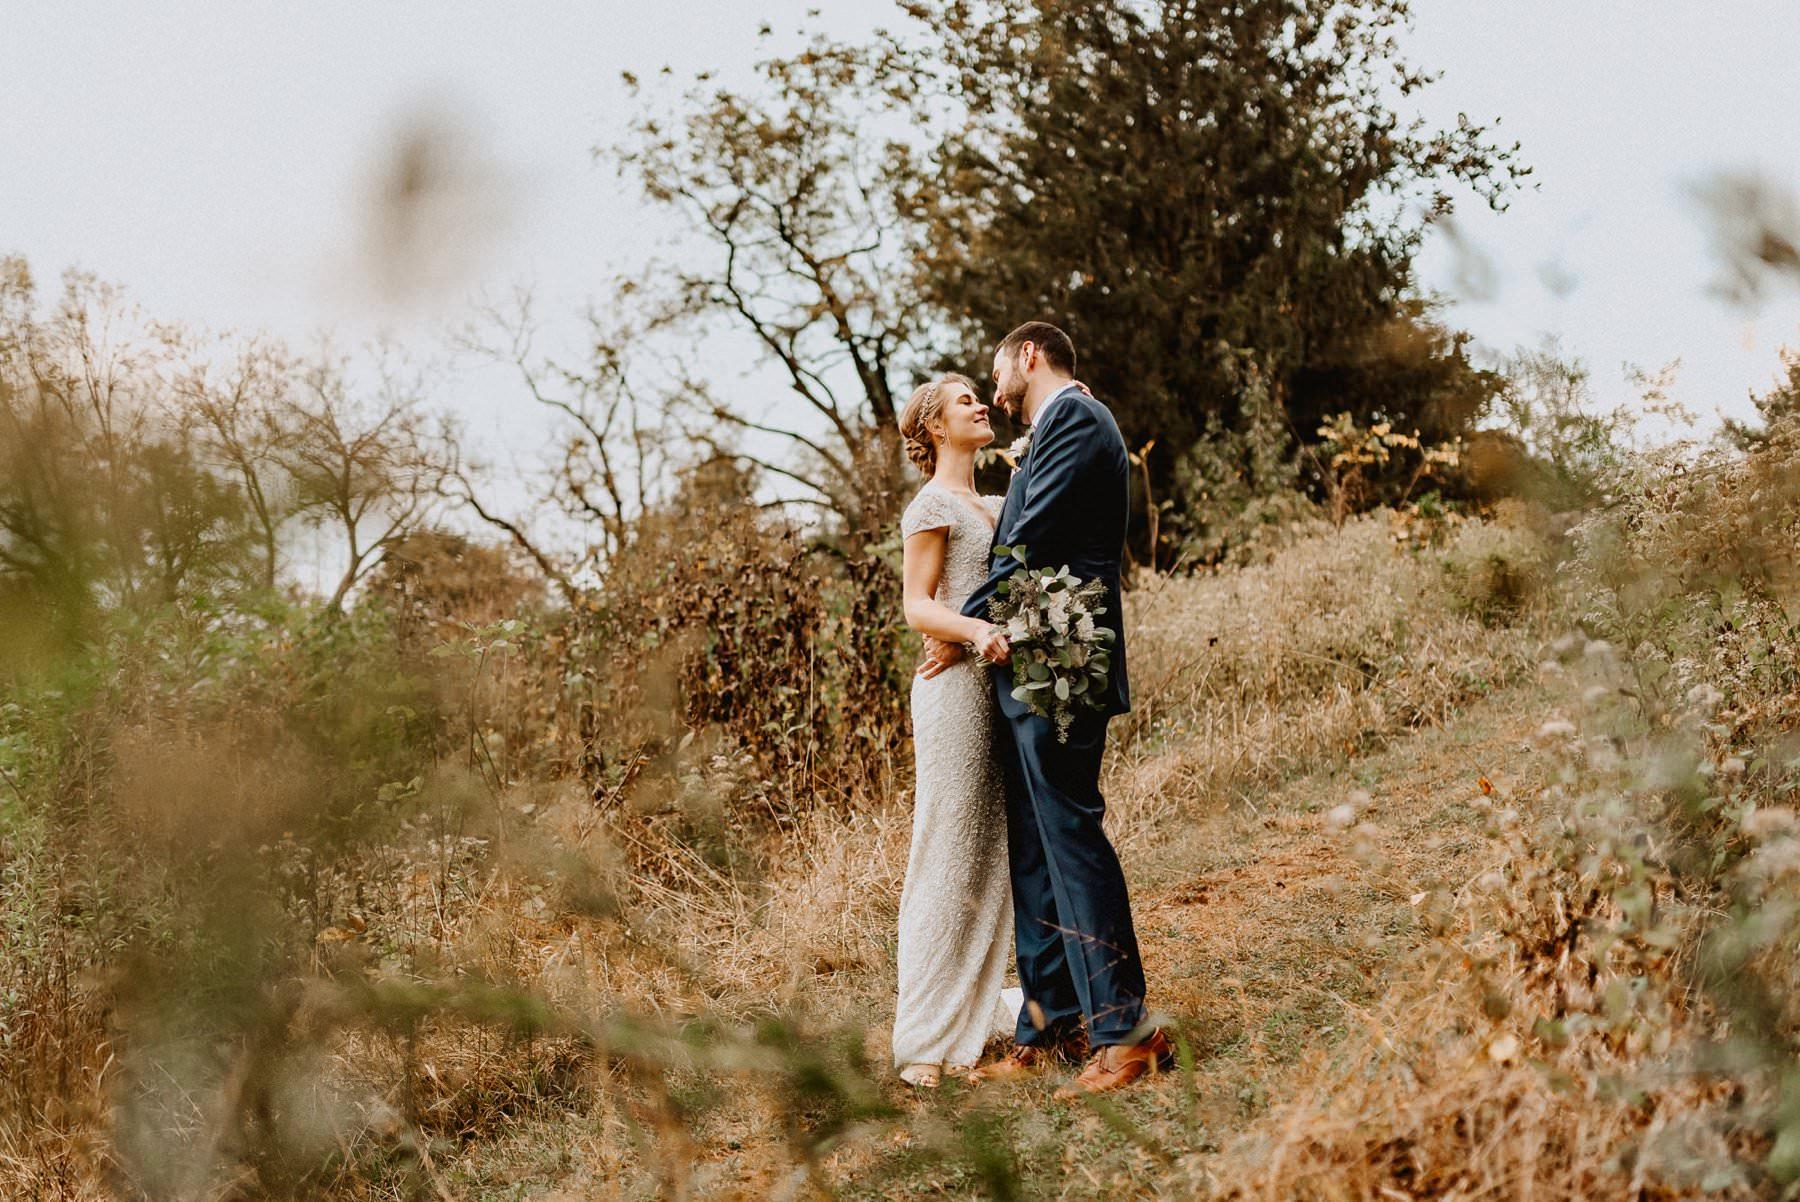 John_James_Audubon_Center_wedding-63.jpg